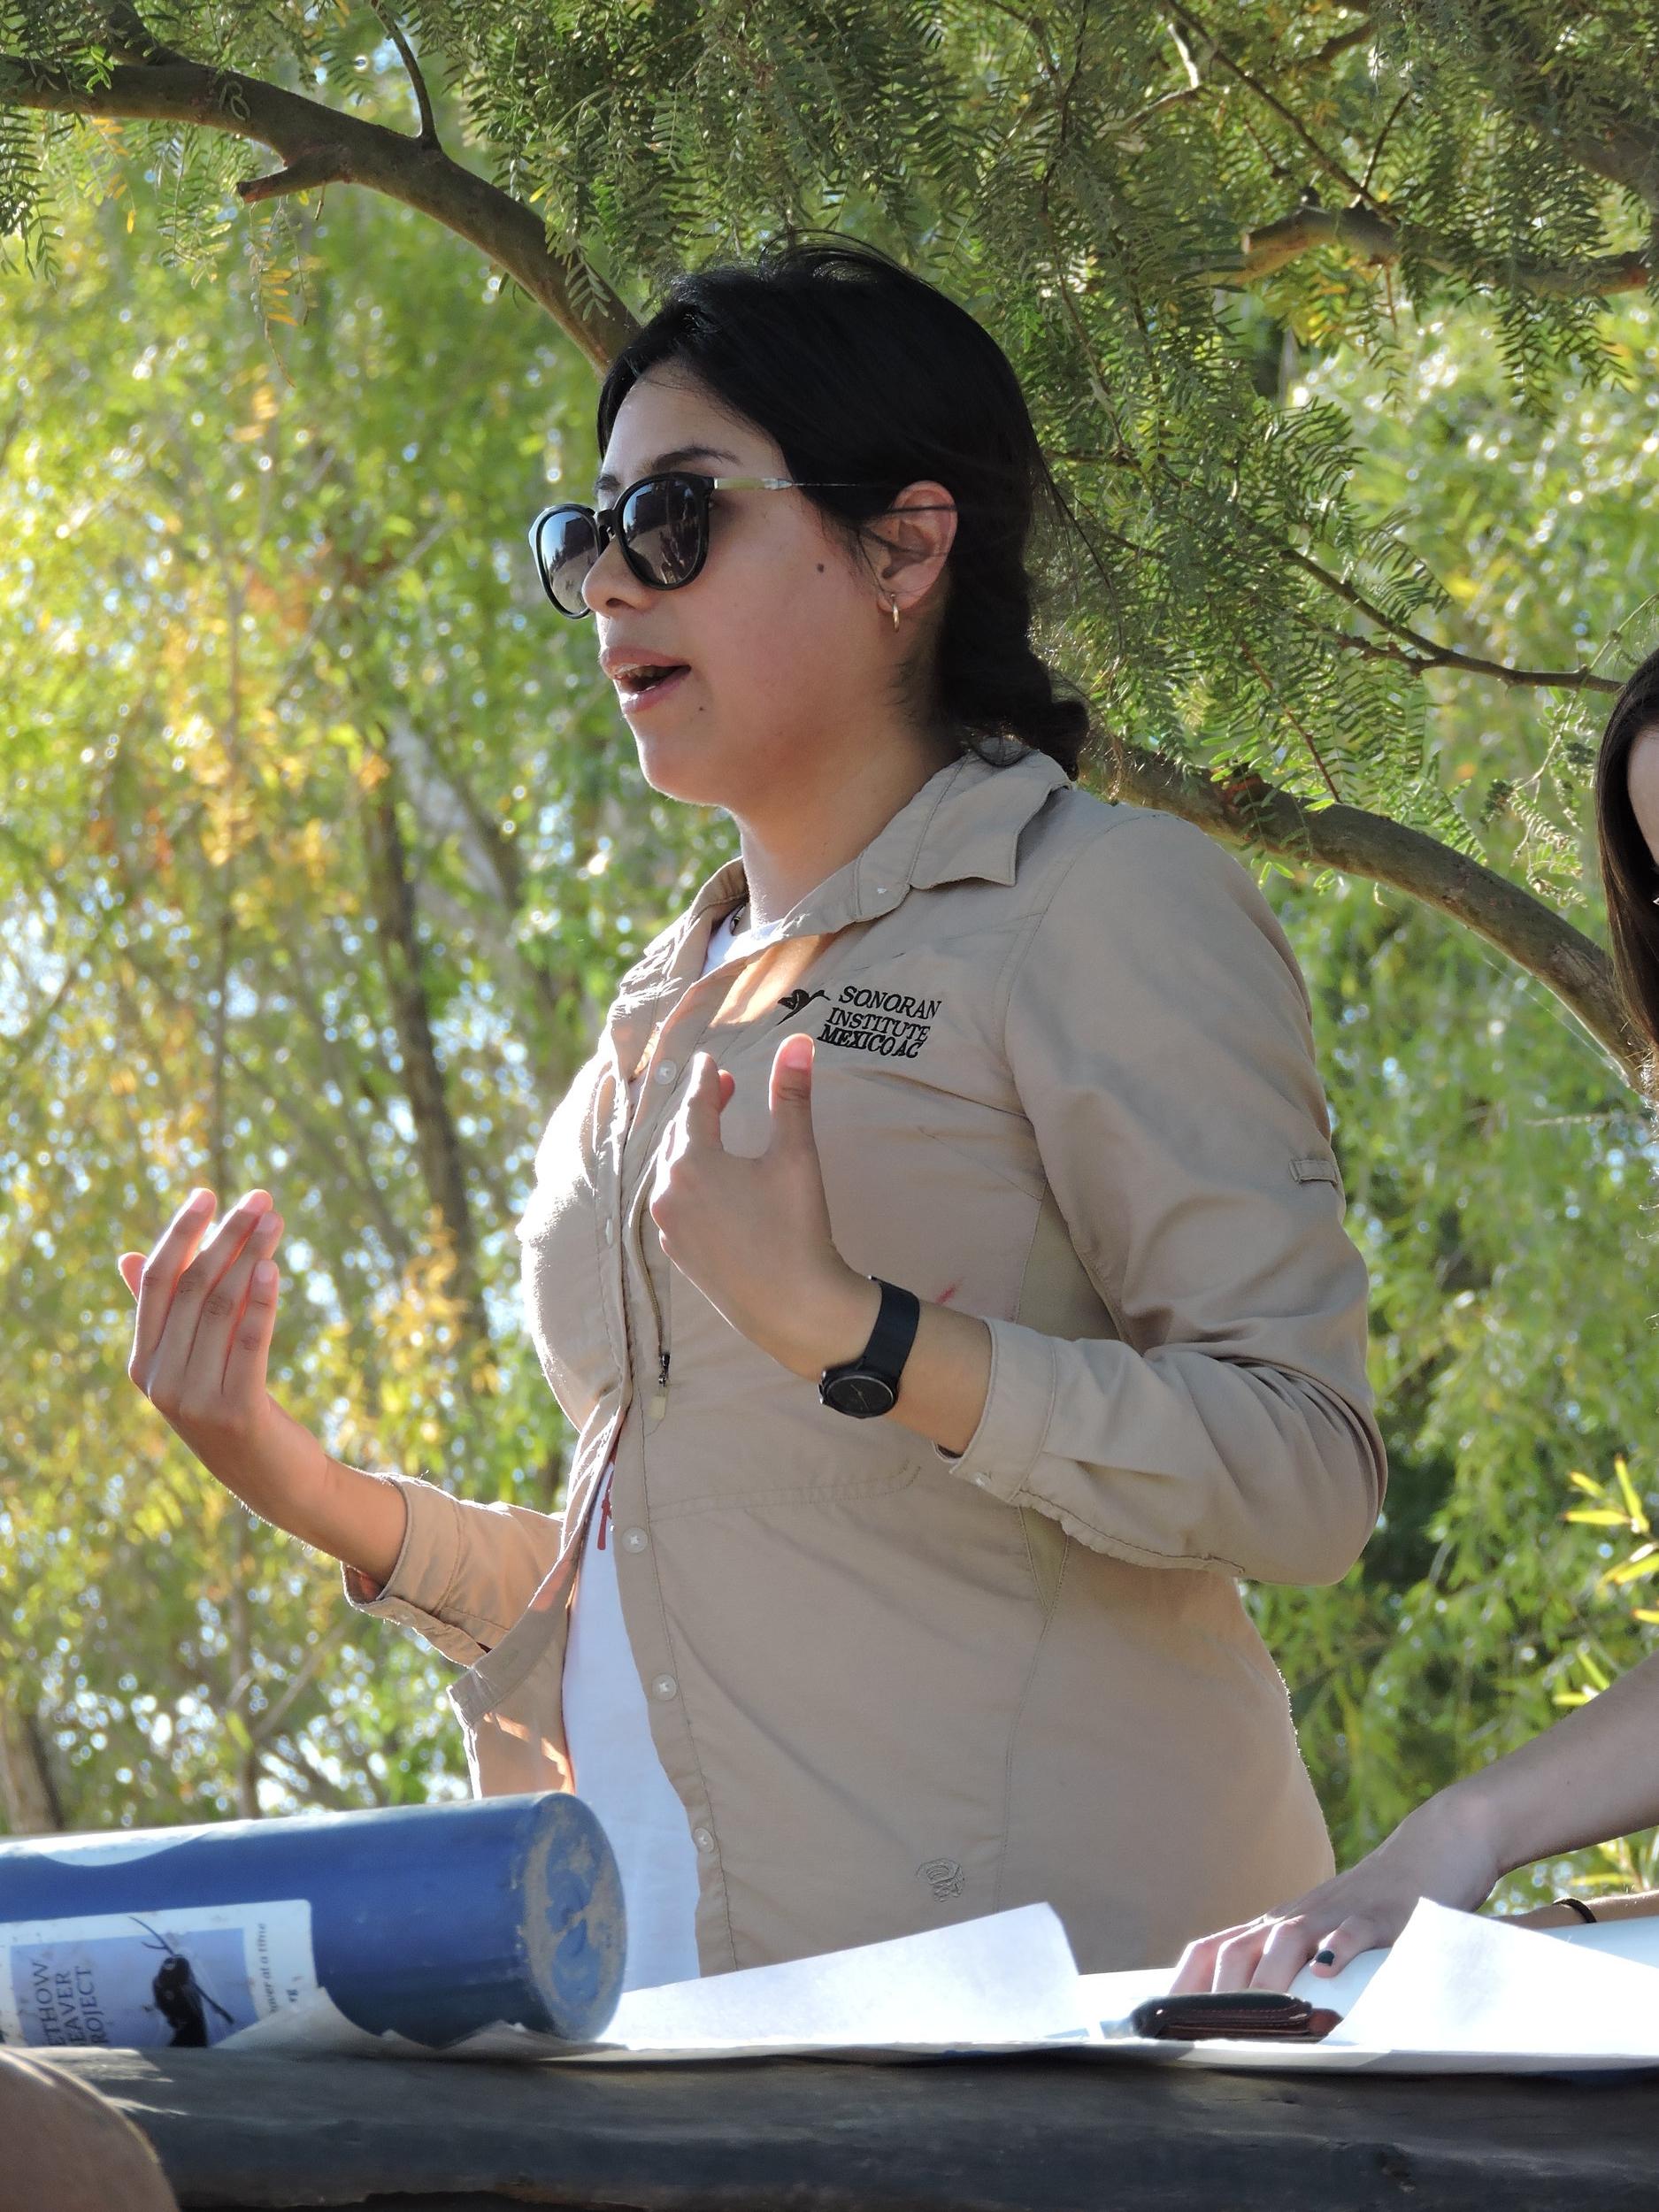 Sandra Ortiz   Restoration Coordinator, Sonoran Institute  Mexicali, Baja California